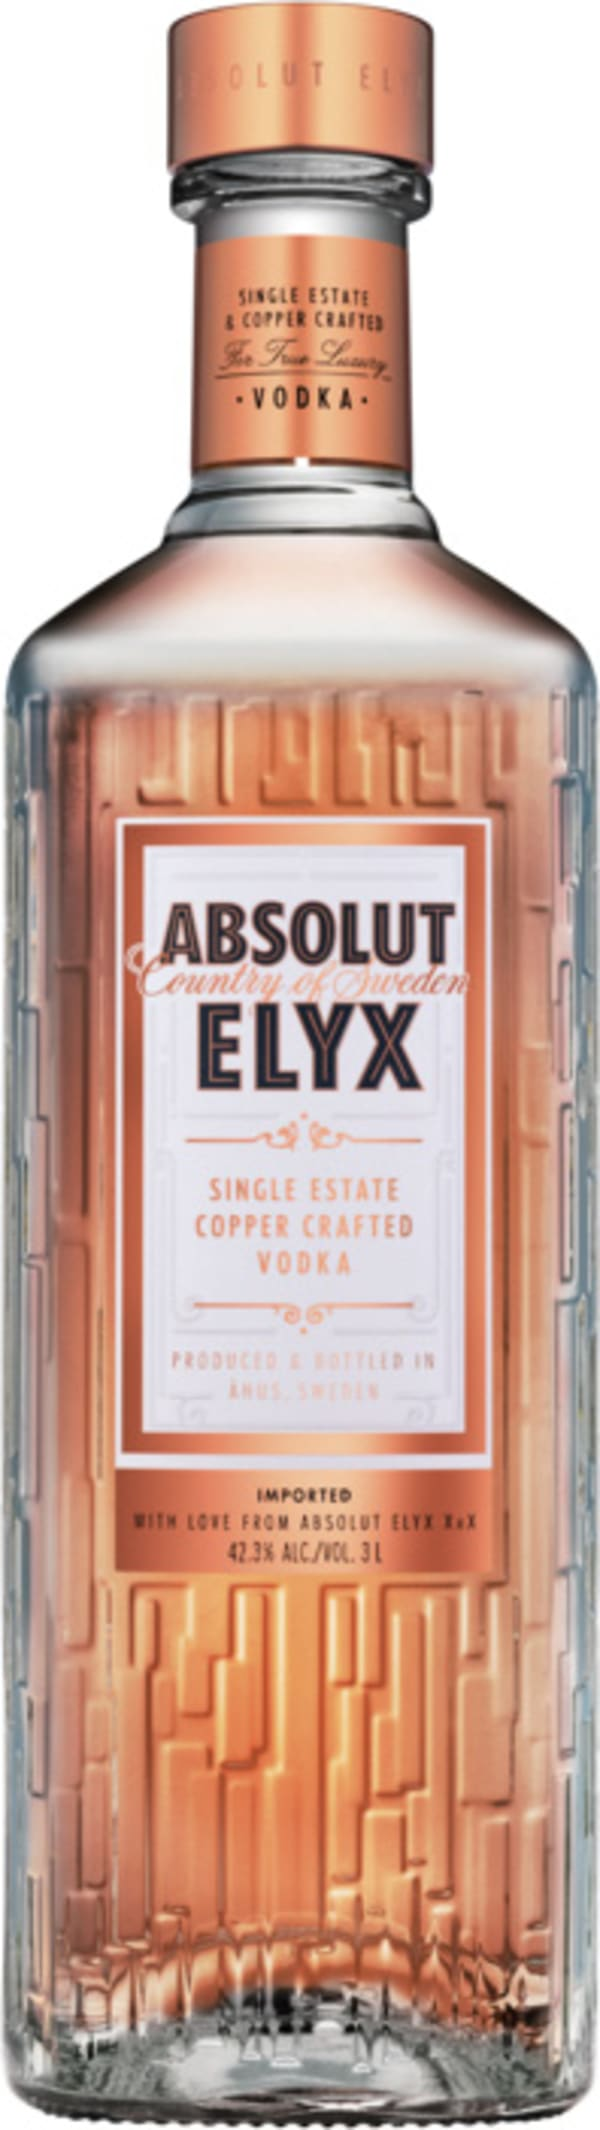 Absolut Elyx Single Estate Copper Crafted Vodka